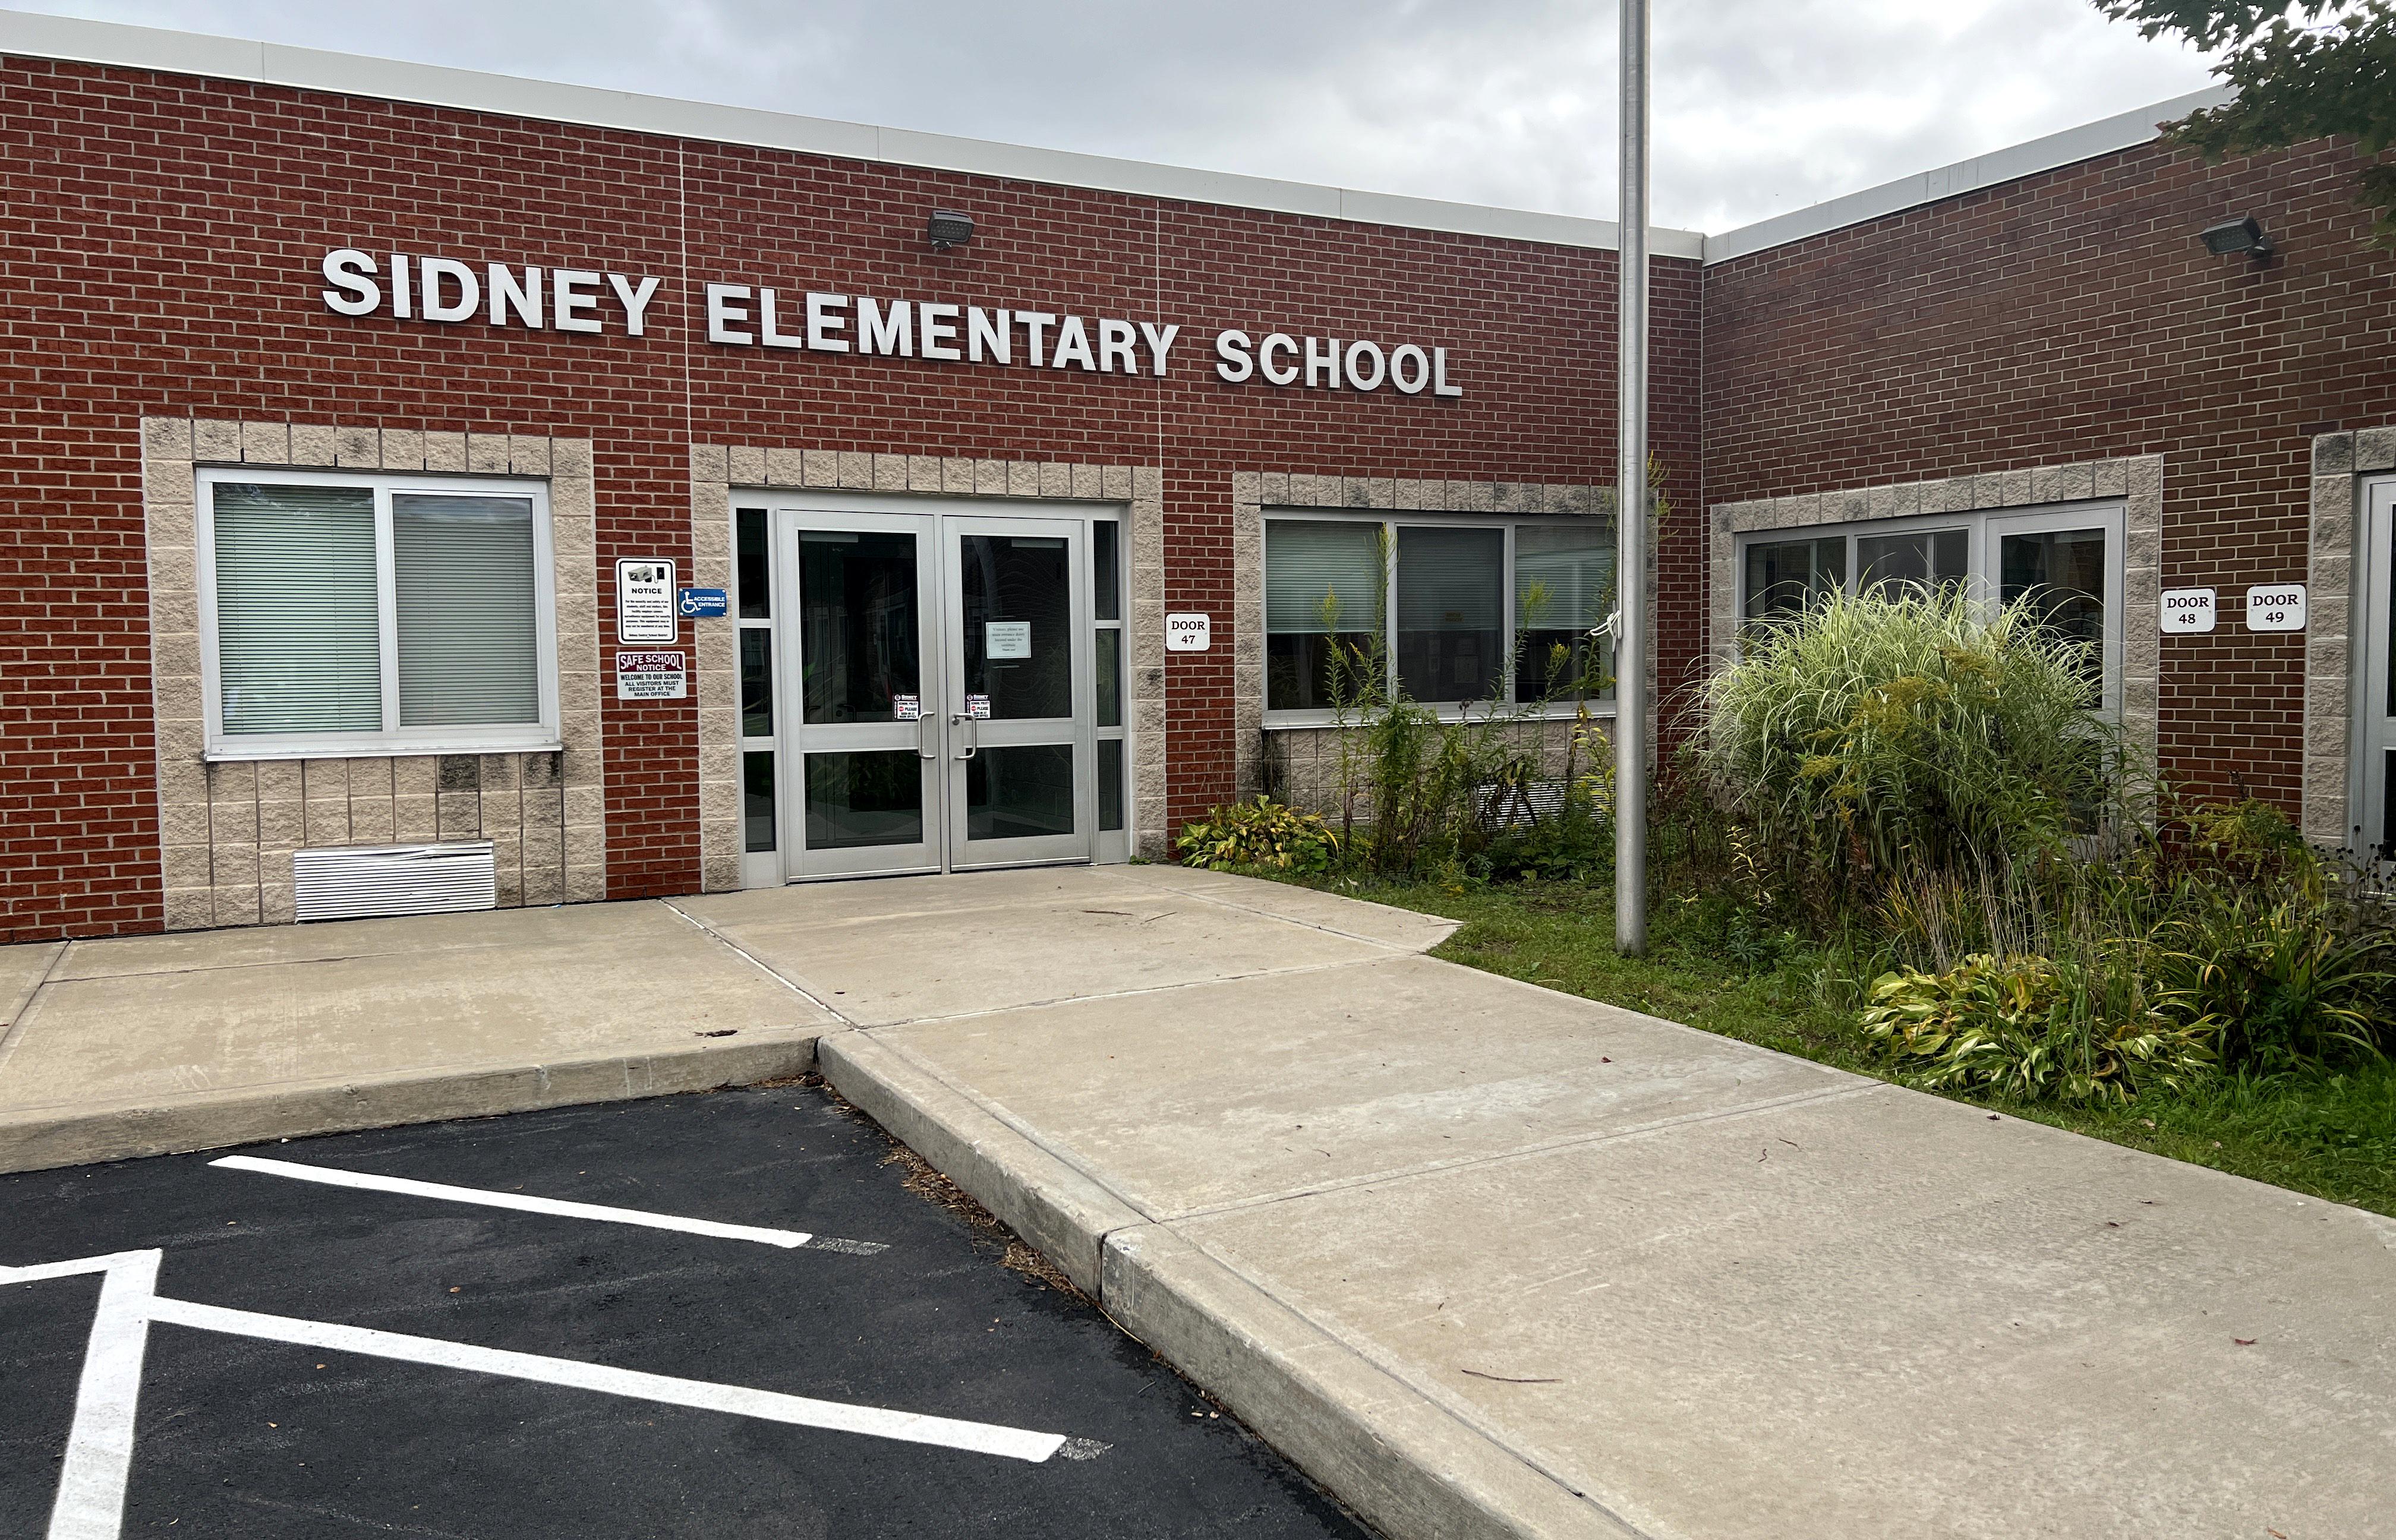 Sidney Elementary School